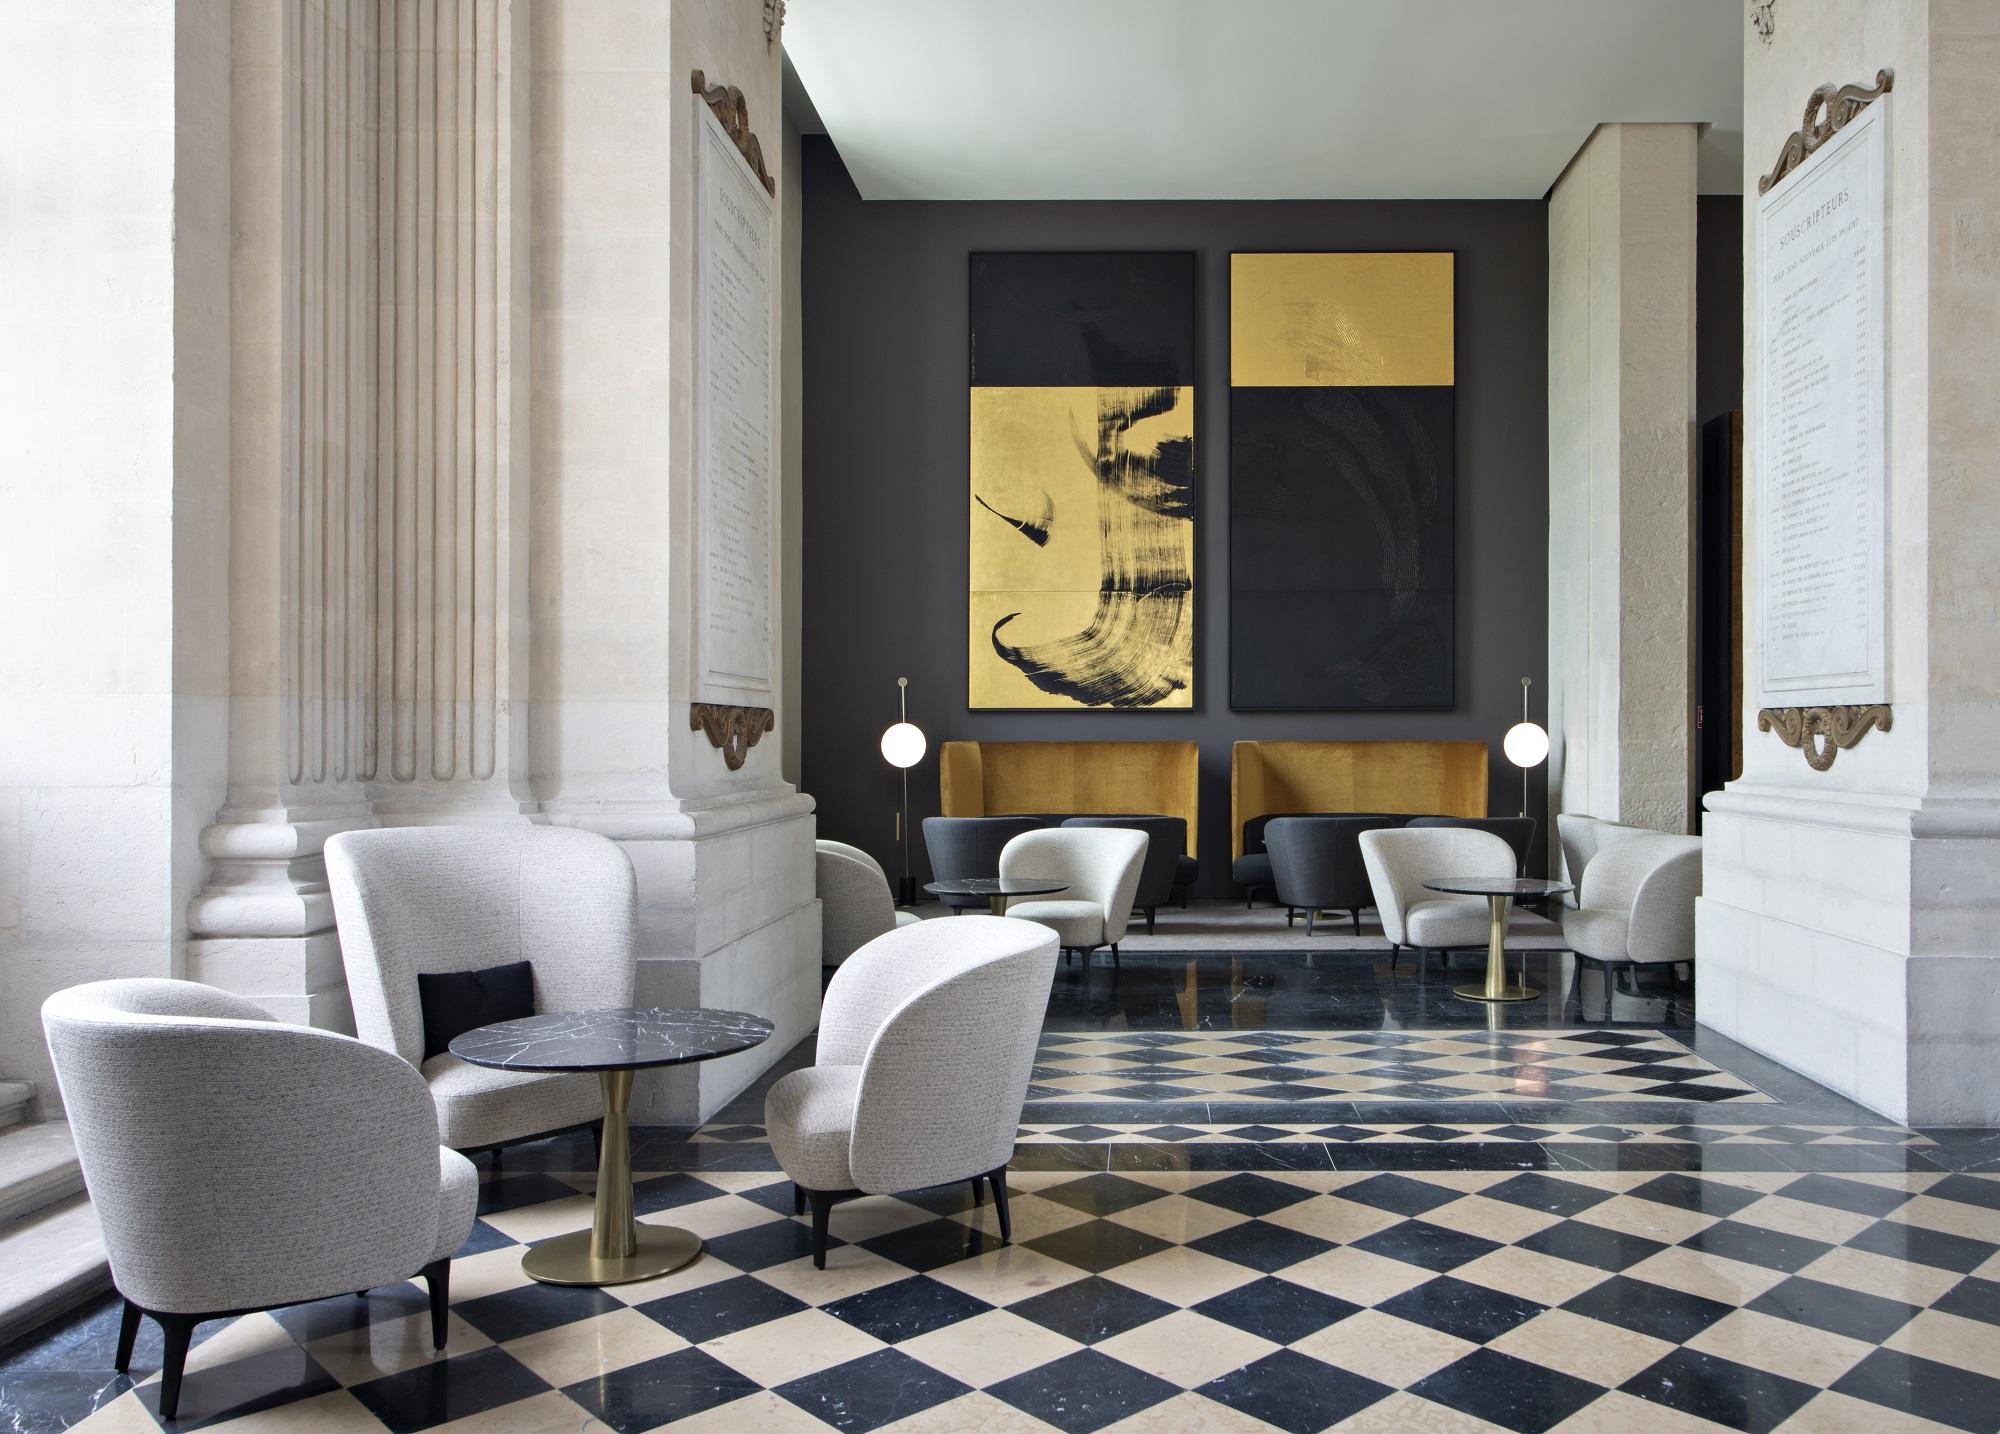 Le Dome bar (c) STUDIO JEAN-PHILIPPE NUEL_INTERCONTINENTAL LYON HOTEL DIEU_NICOLAS MATHEUS_DSC_1583 (5)